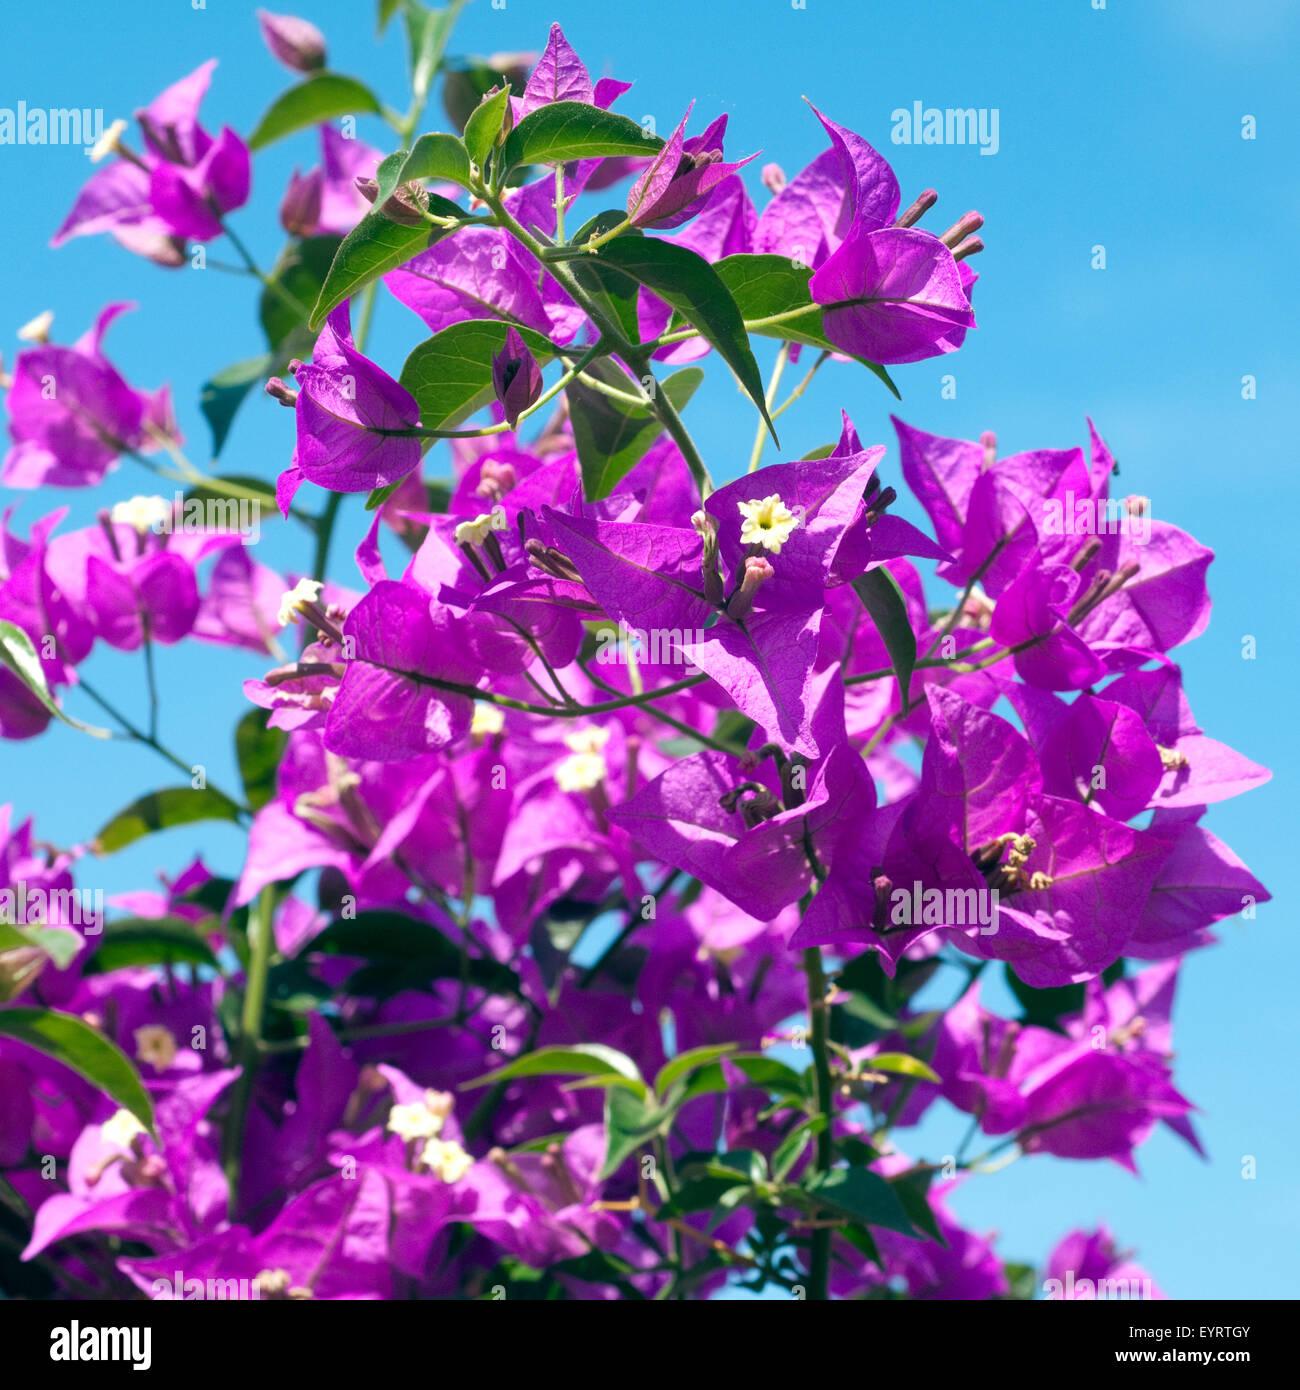 Bougainvillea; Glabra; Spectabilis; Stock Photo